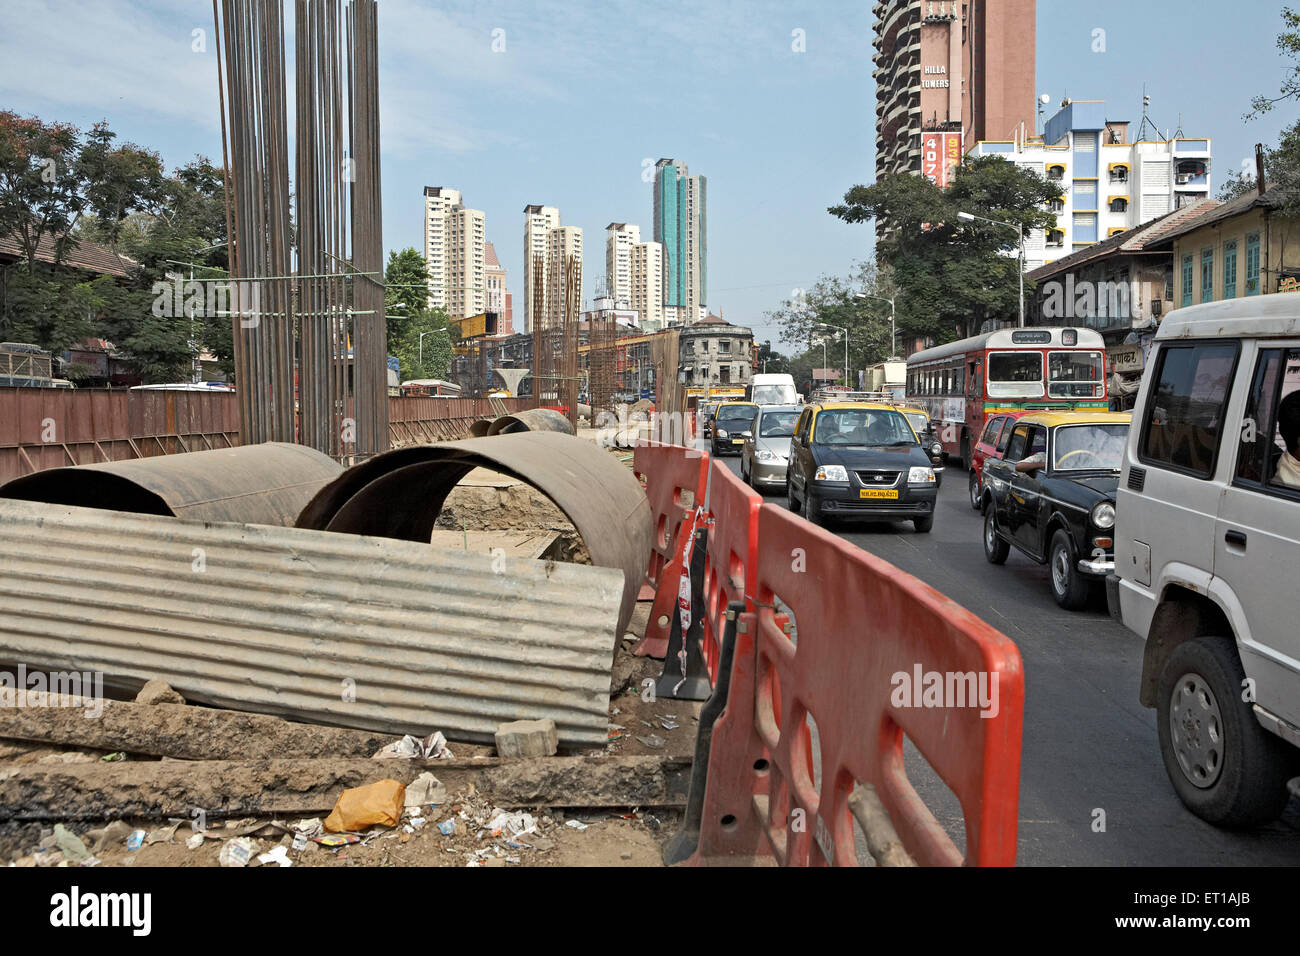 Infrastruktur In Arbeit an stark befahrenen Straße Mumbai Indien Asien Stockbild